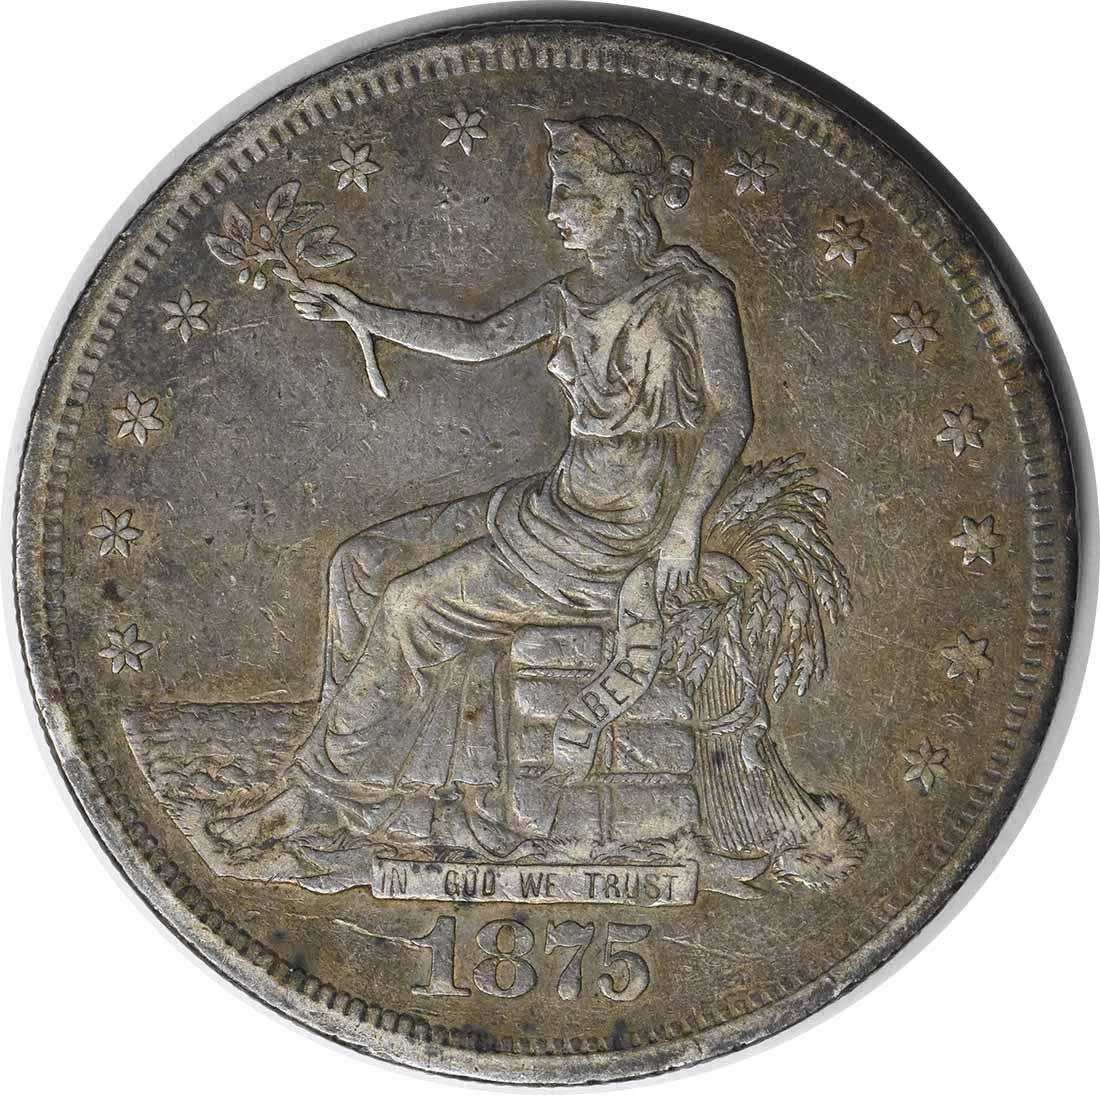 1875-CC Trade Silver Dollar EF Uncertified